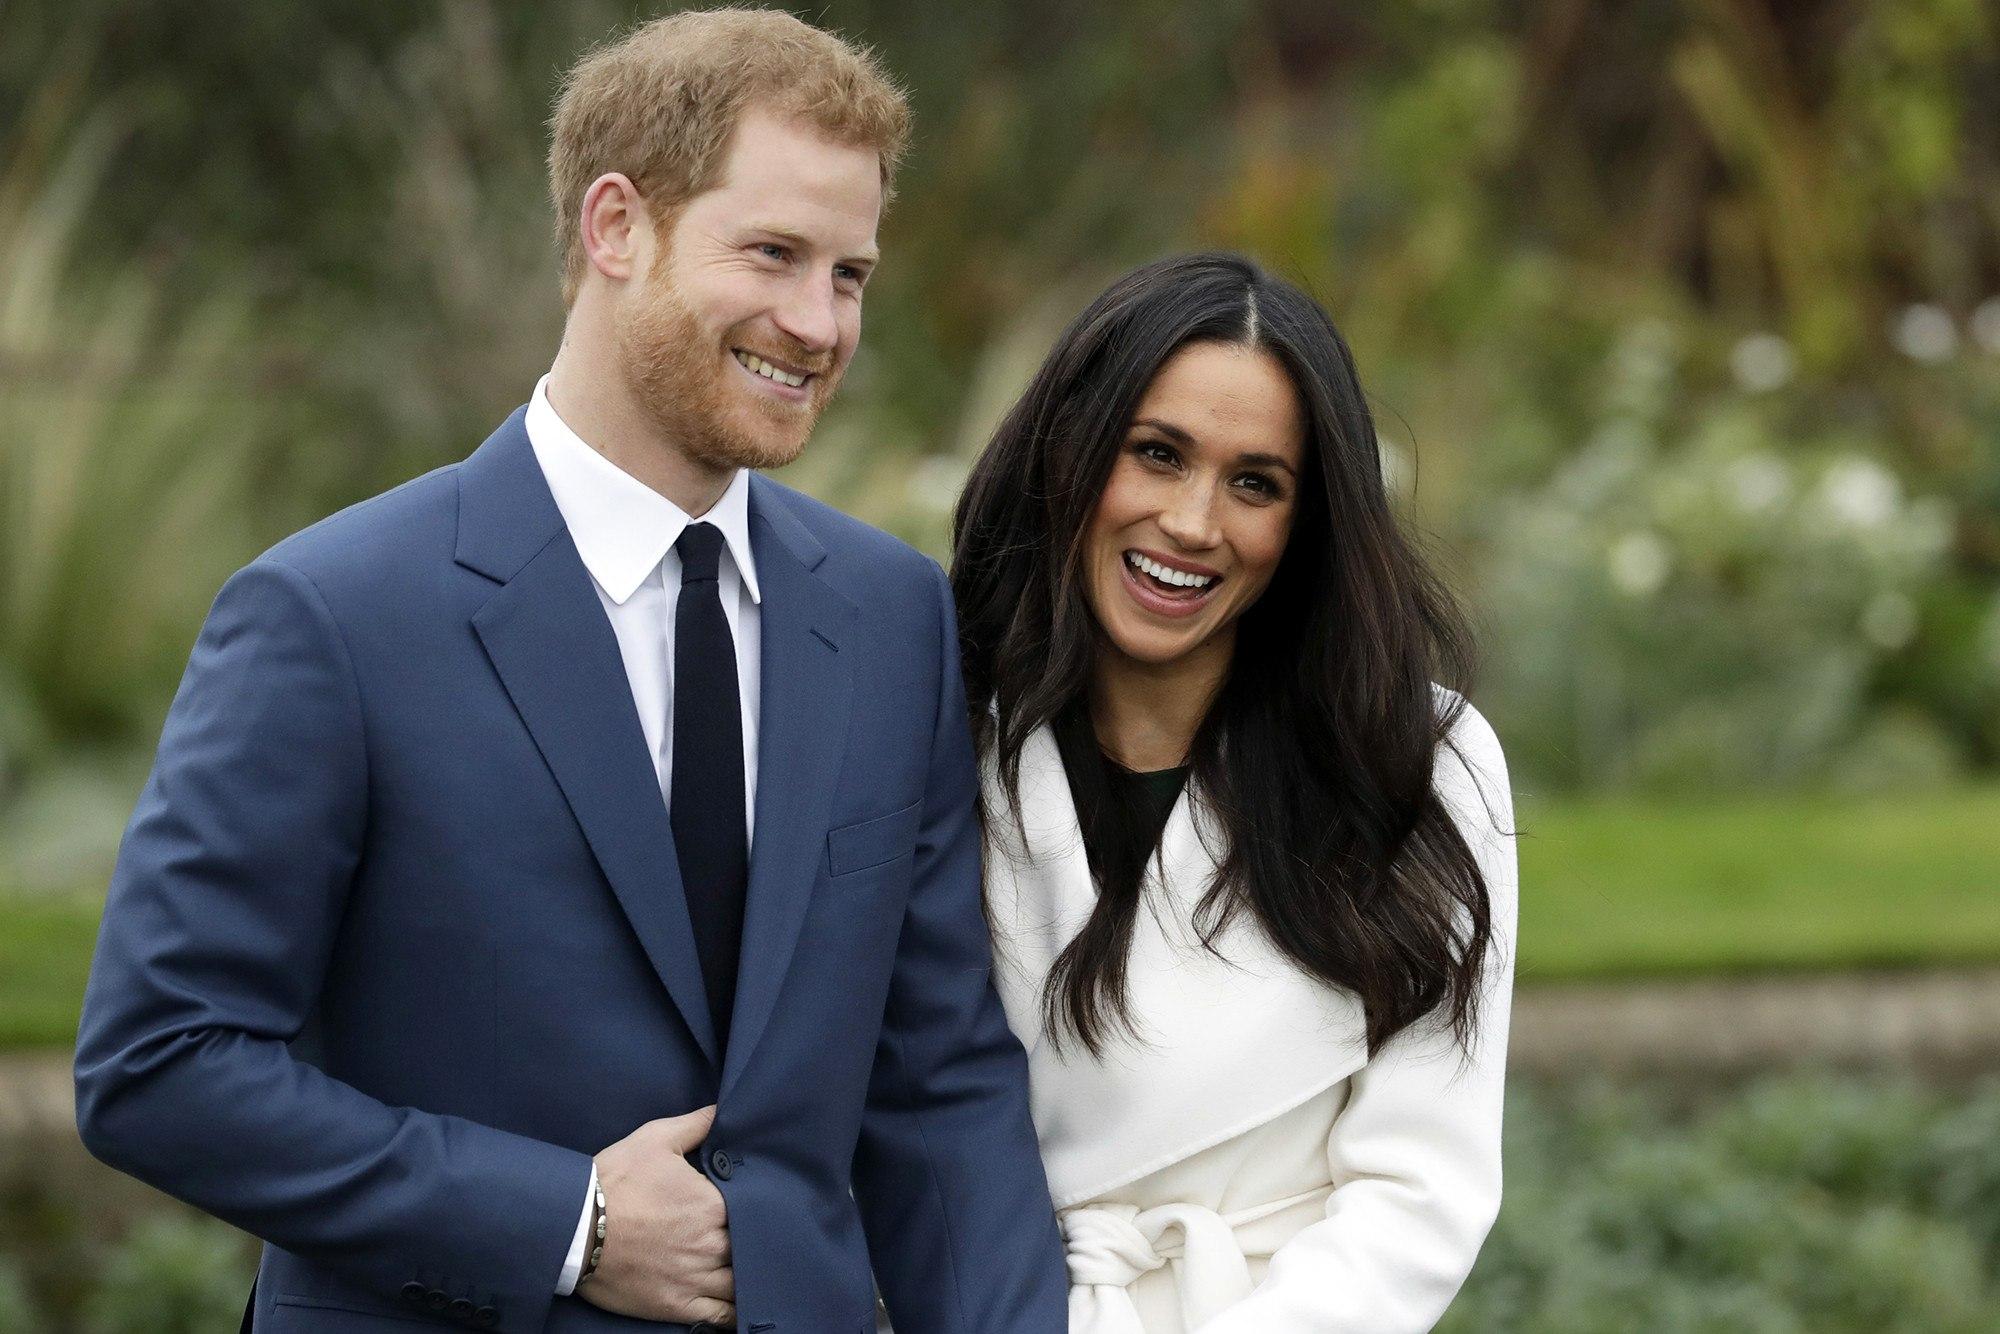 Ladbrokes Stops Taking Bets on Meghan Markle Wedding Dress Designer